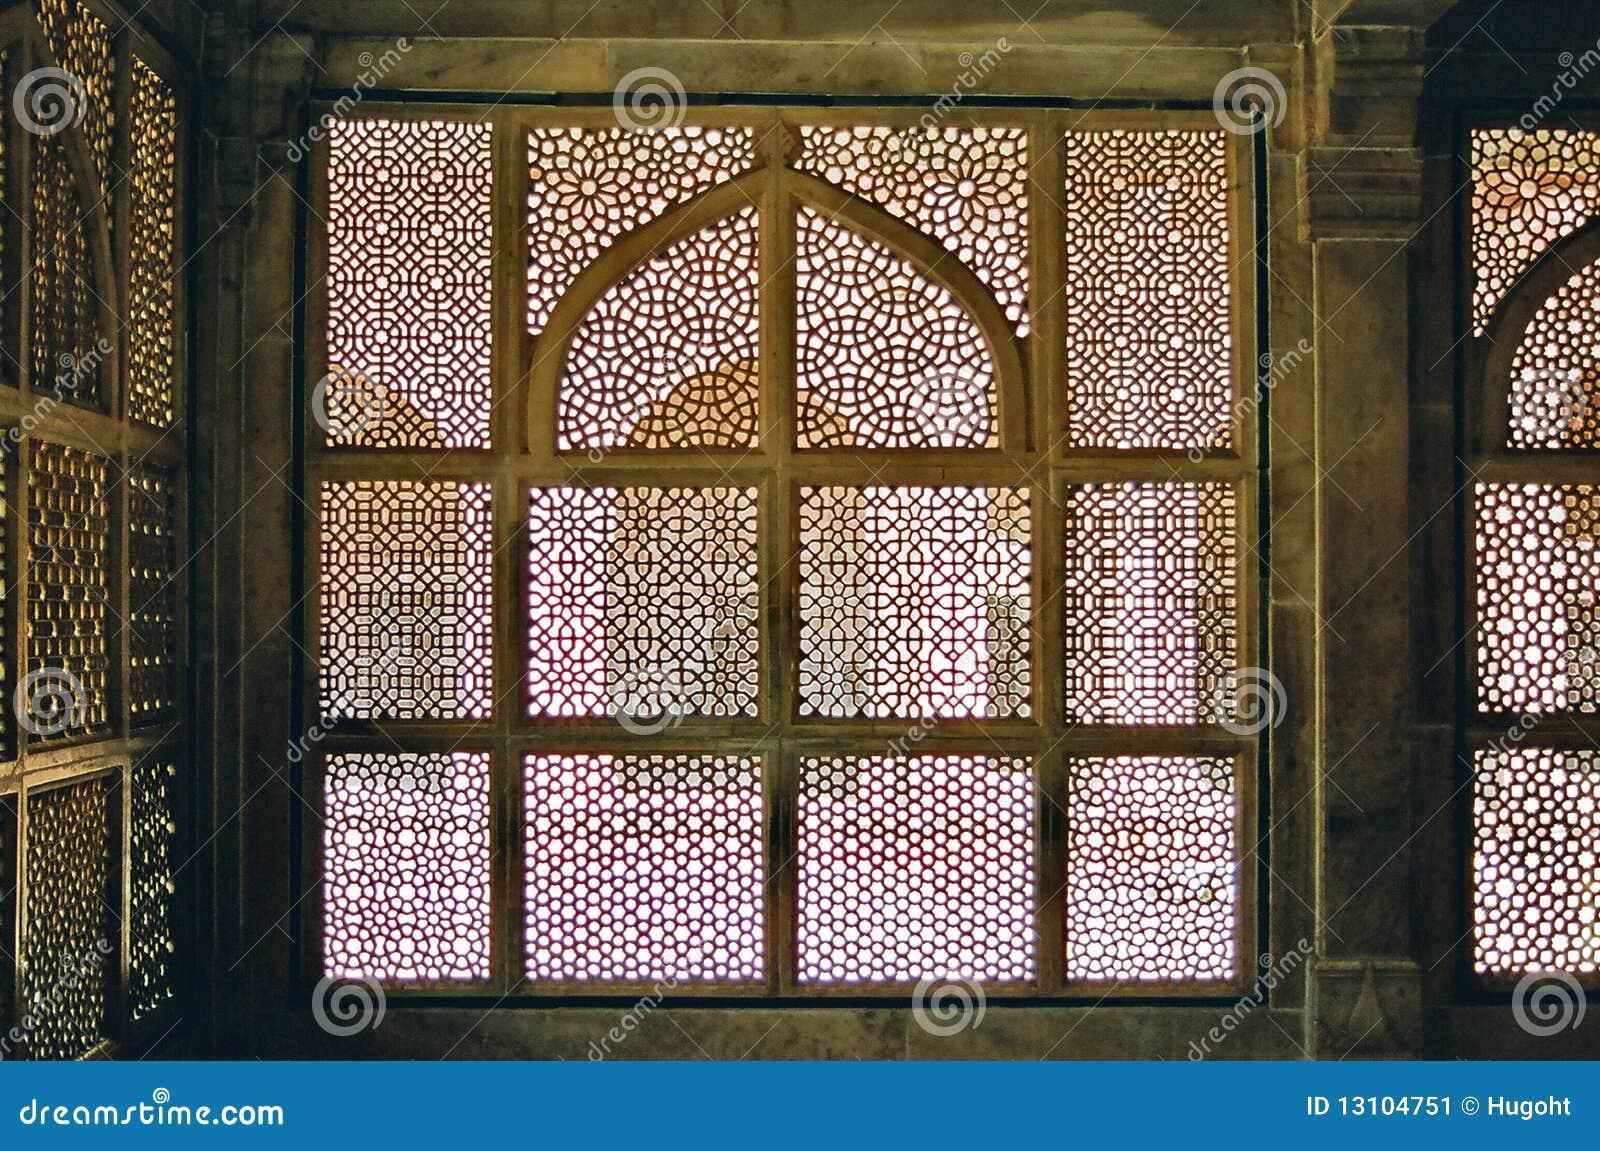 Fatehpur Sikri Jain architecture, India